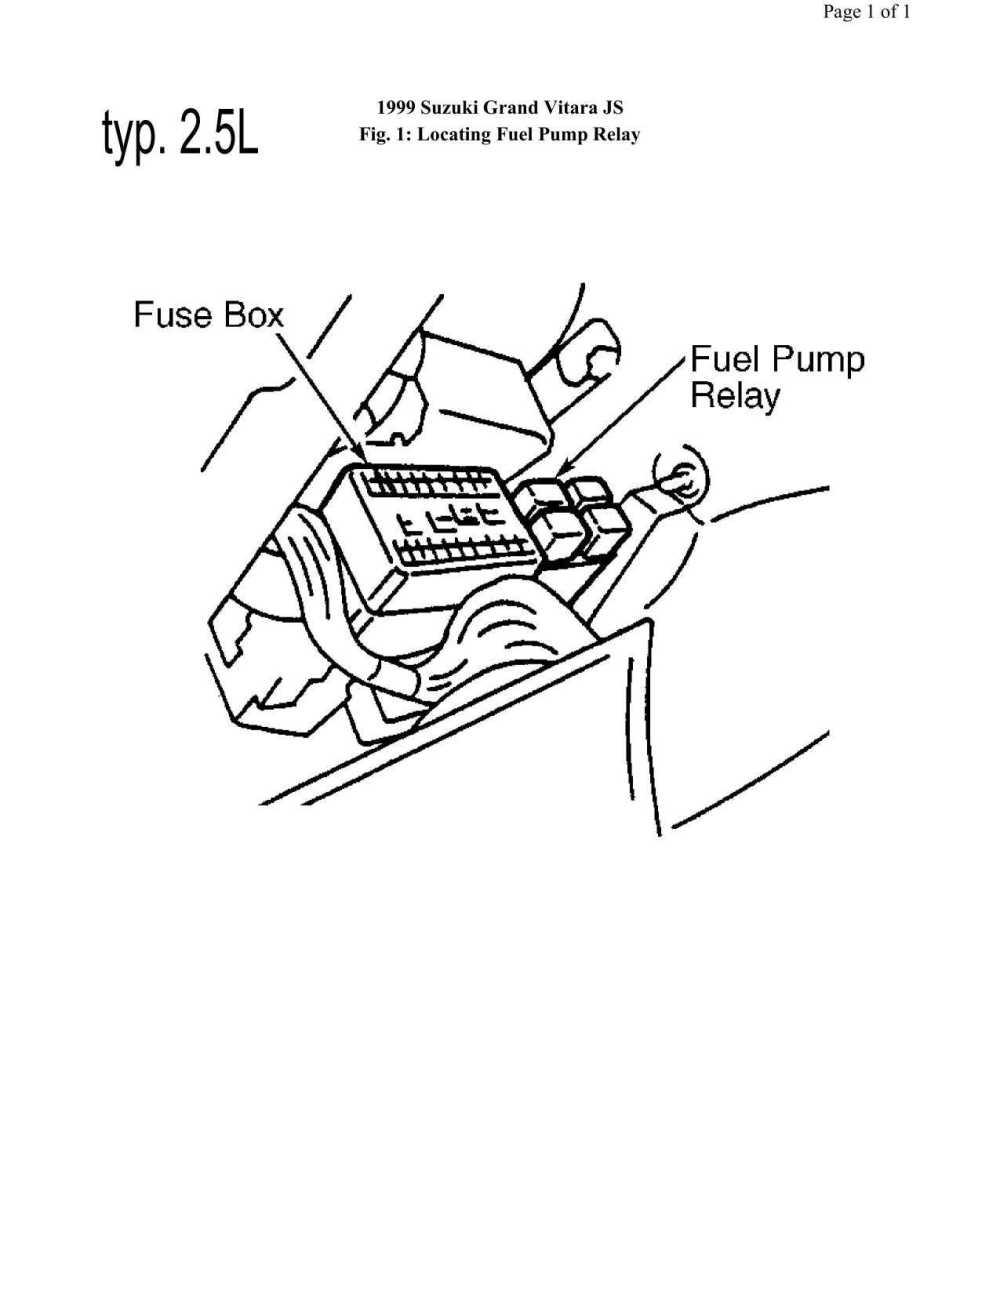 medium resolution of 1999 suzuki vitara fuse diagram wiring diagrams schema rh 35 verena hoegerl de 1999 suzuki grand vitara fuse box diagram 1999 suzuki vitara fuse box